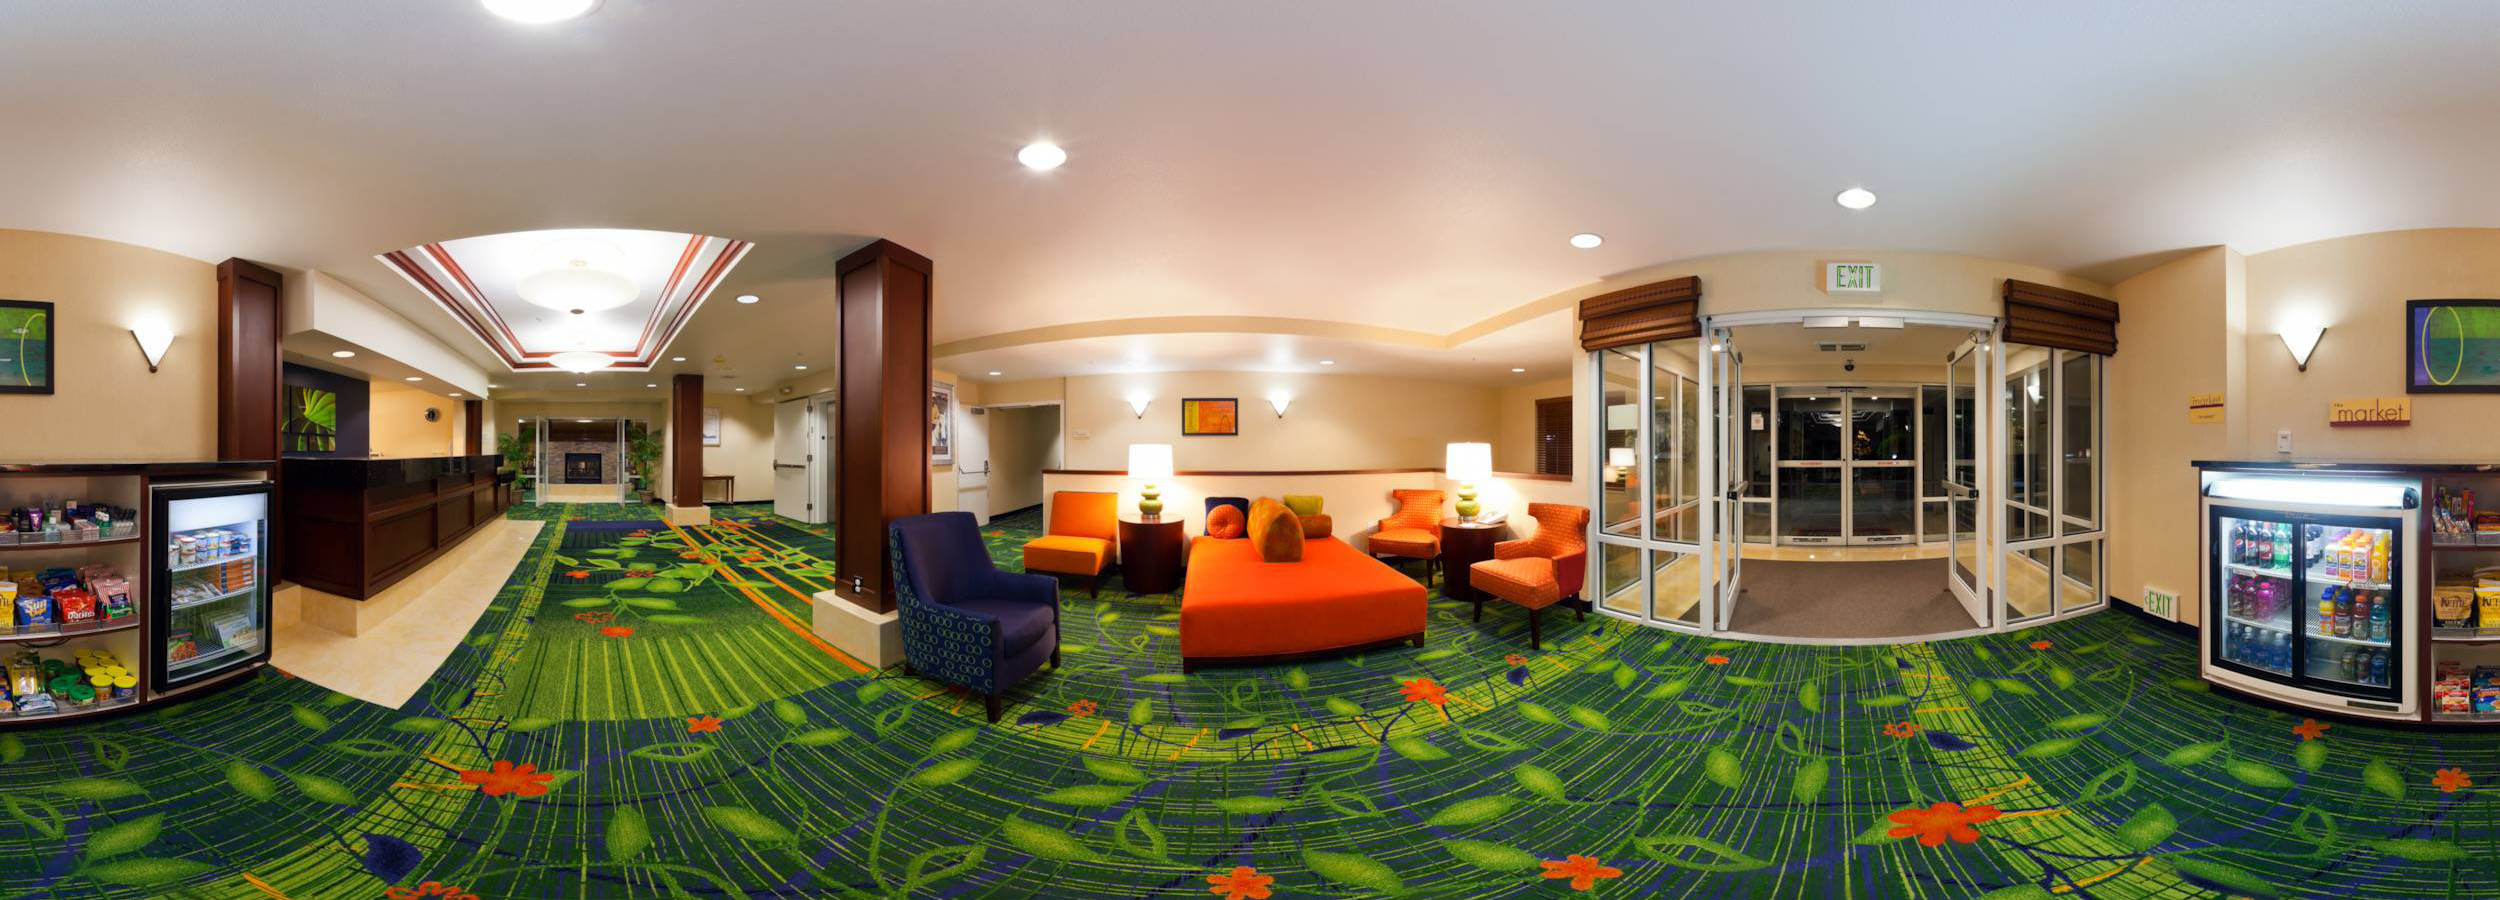 Hotels Motels Beaverton Oregon